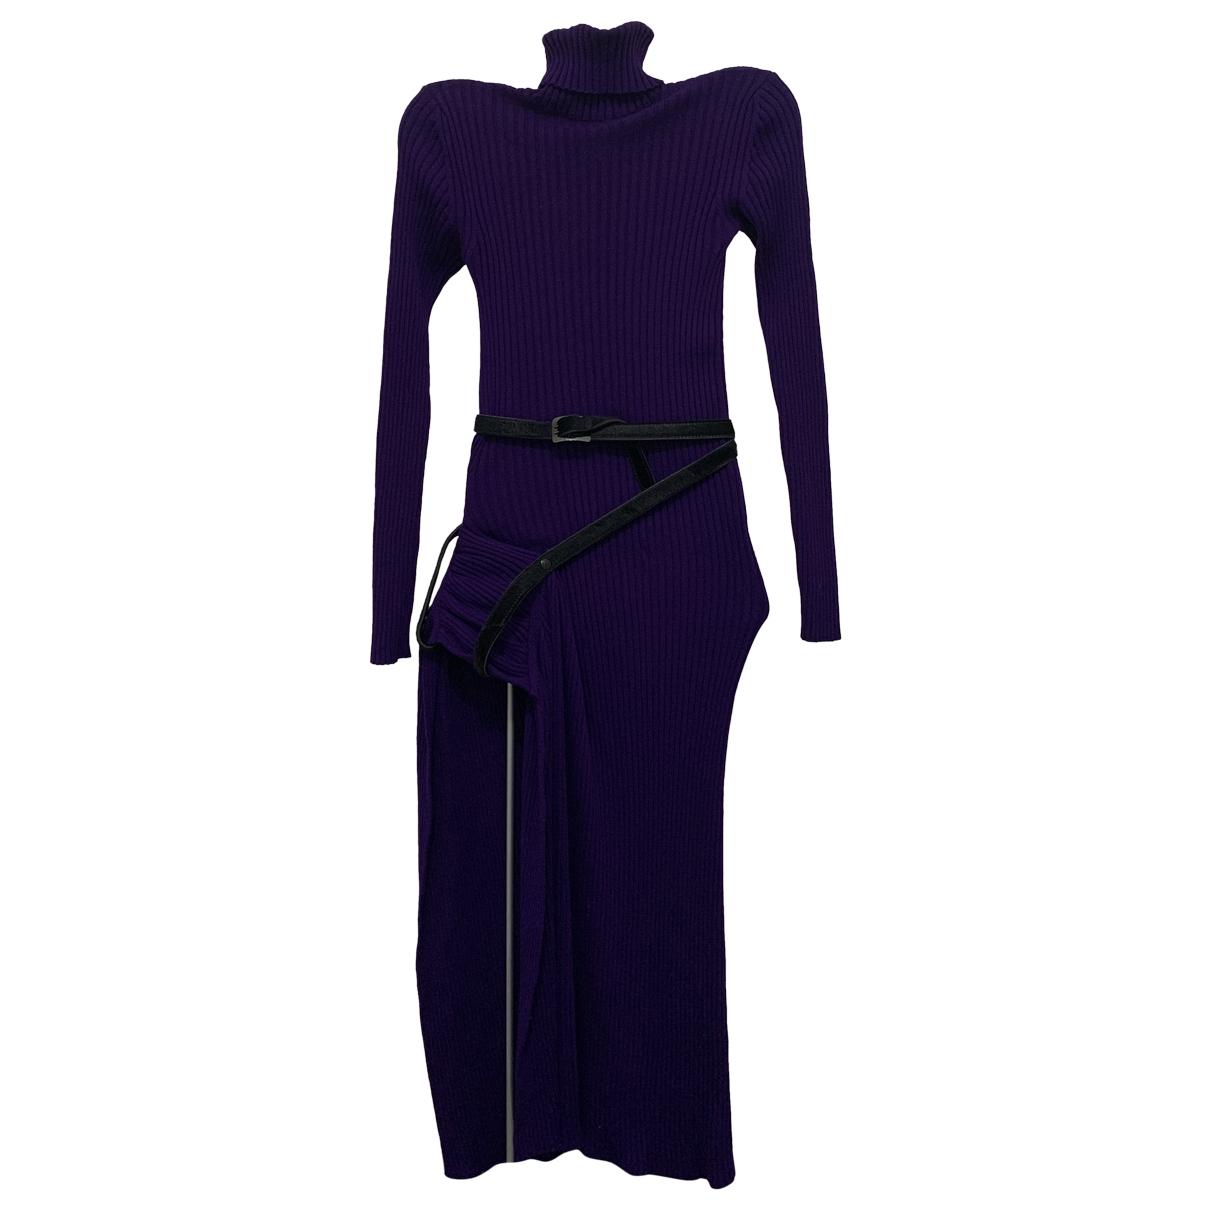 Vestido midi de Lana Jean Paul Gaultier